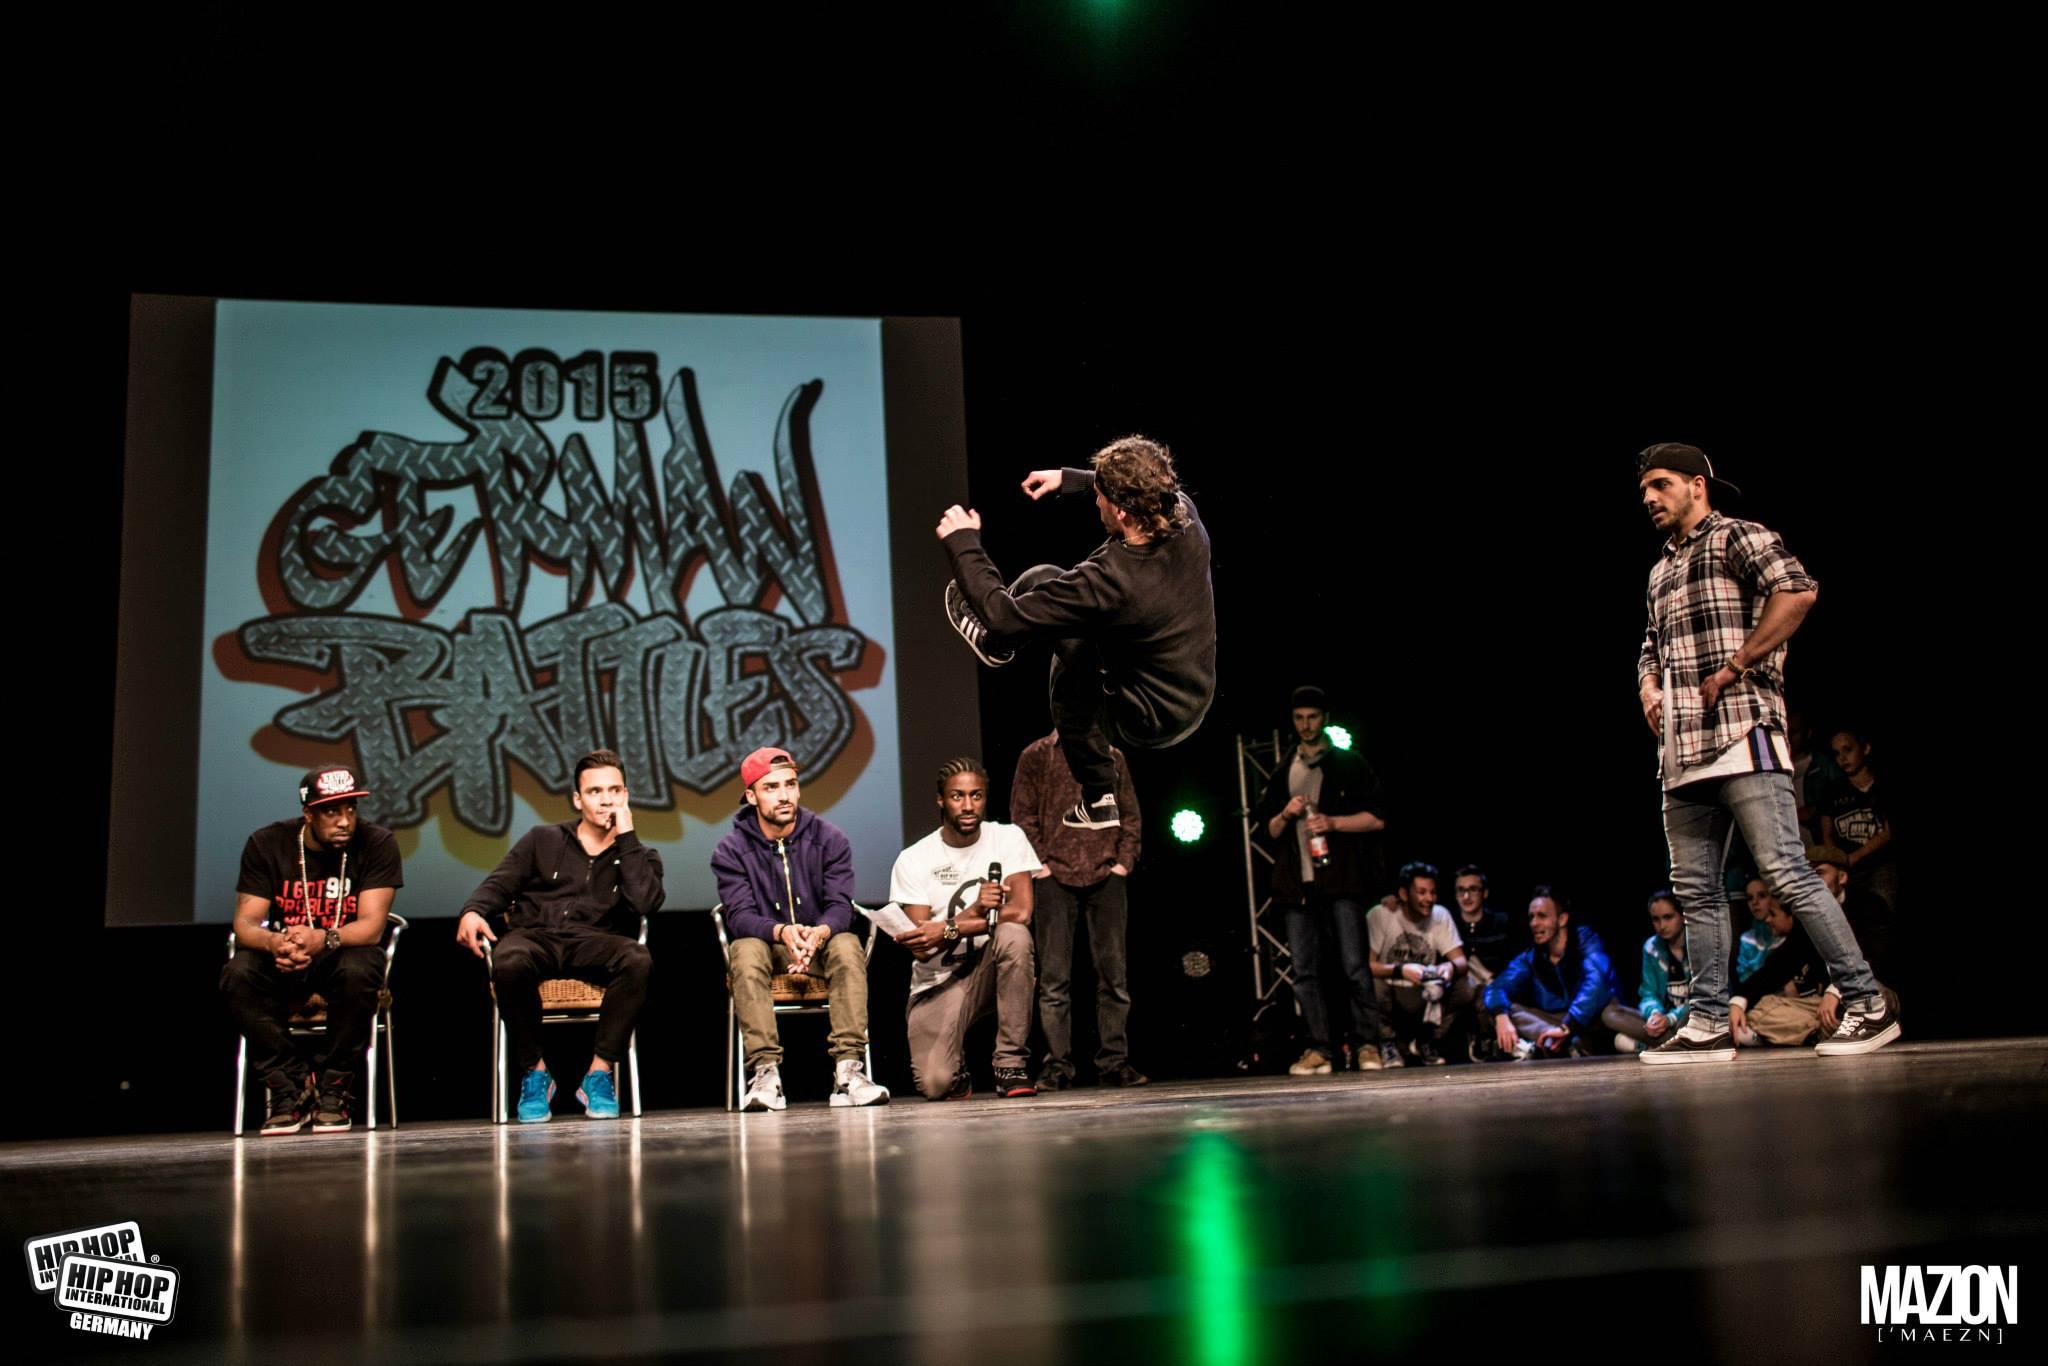 berühmte hip hopper in deutschland